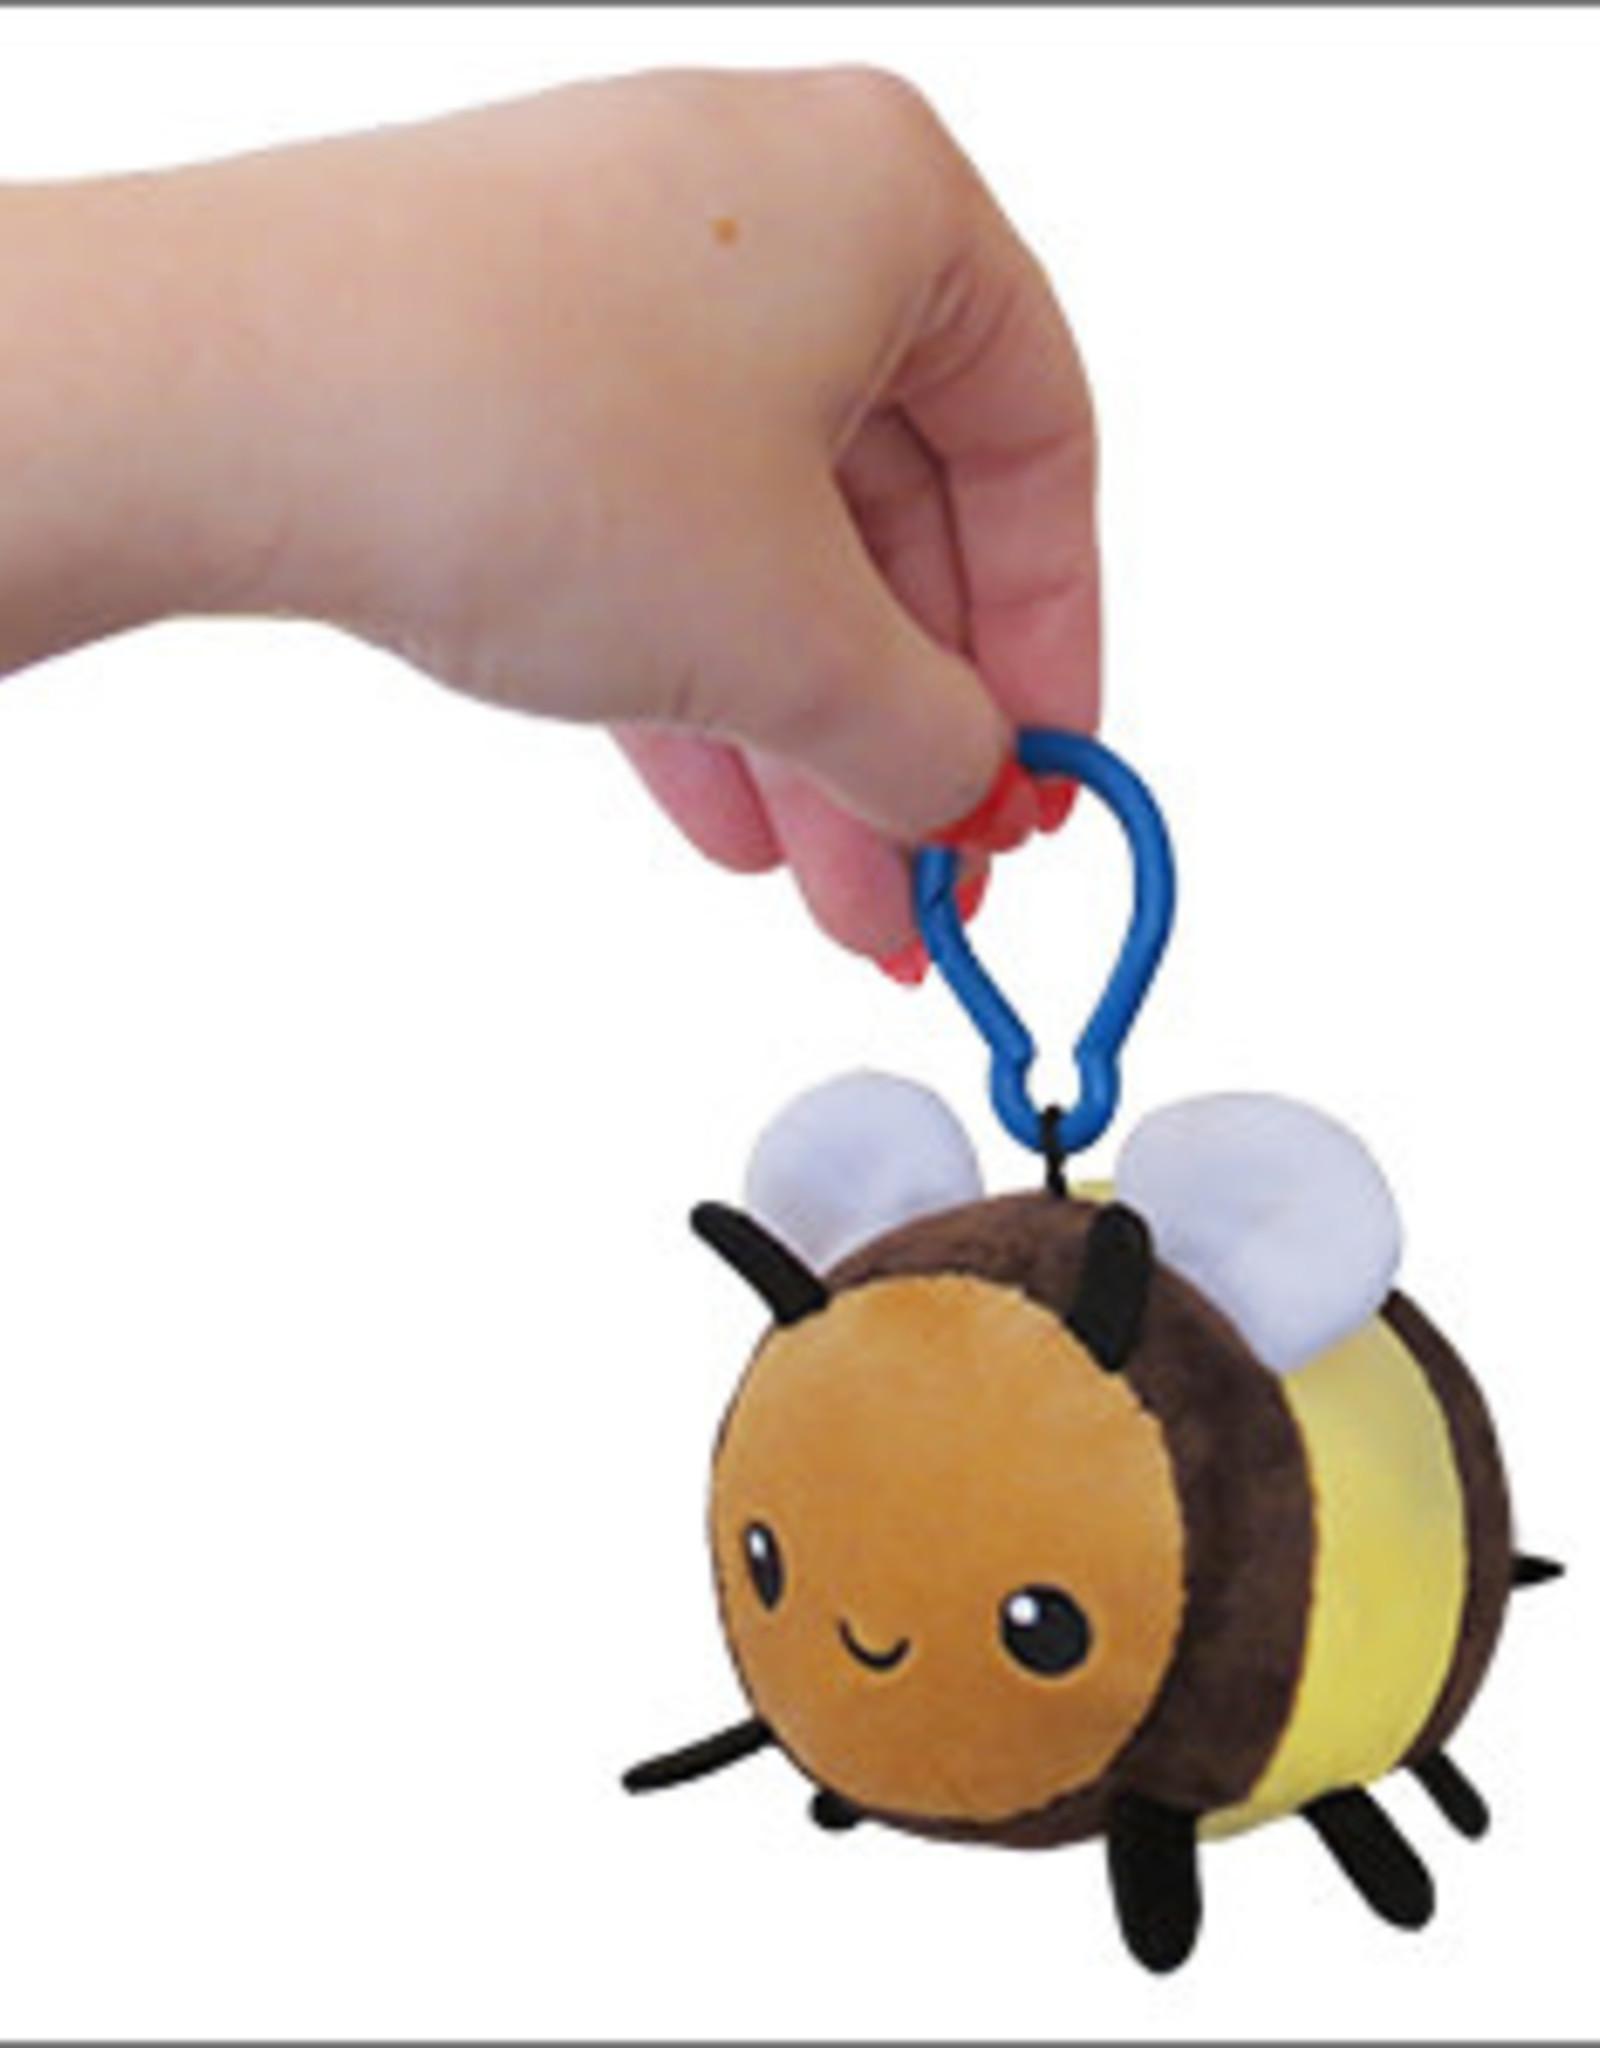 Squishable Micro Squishable Fuzzy Bumblebee